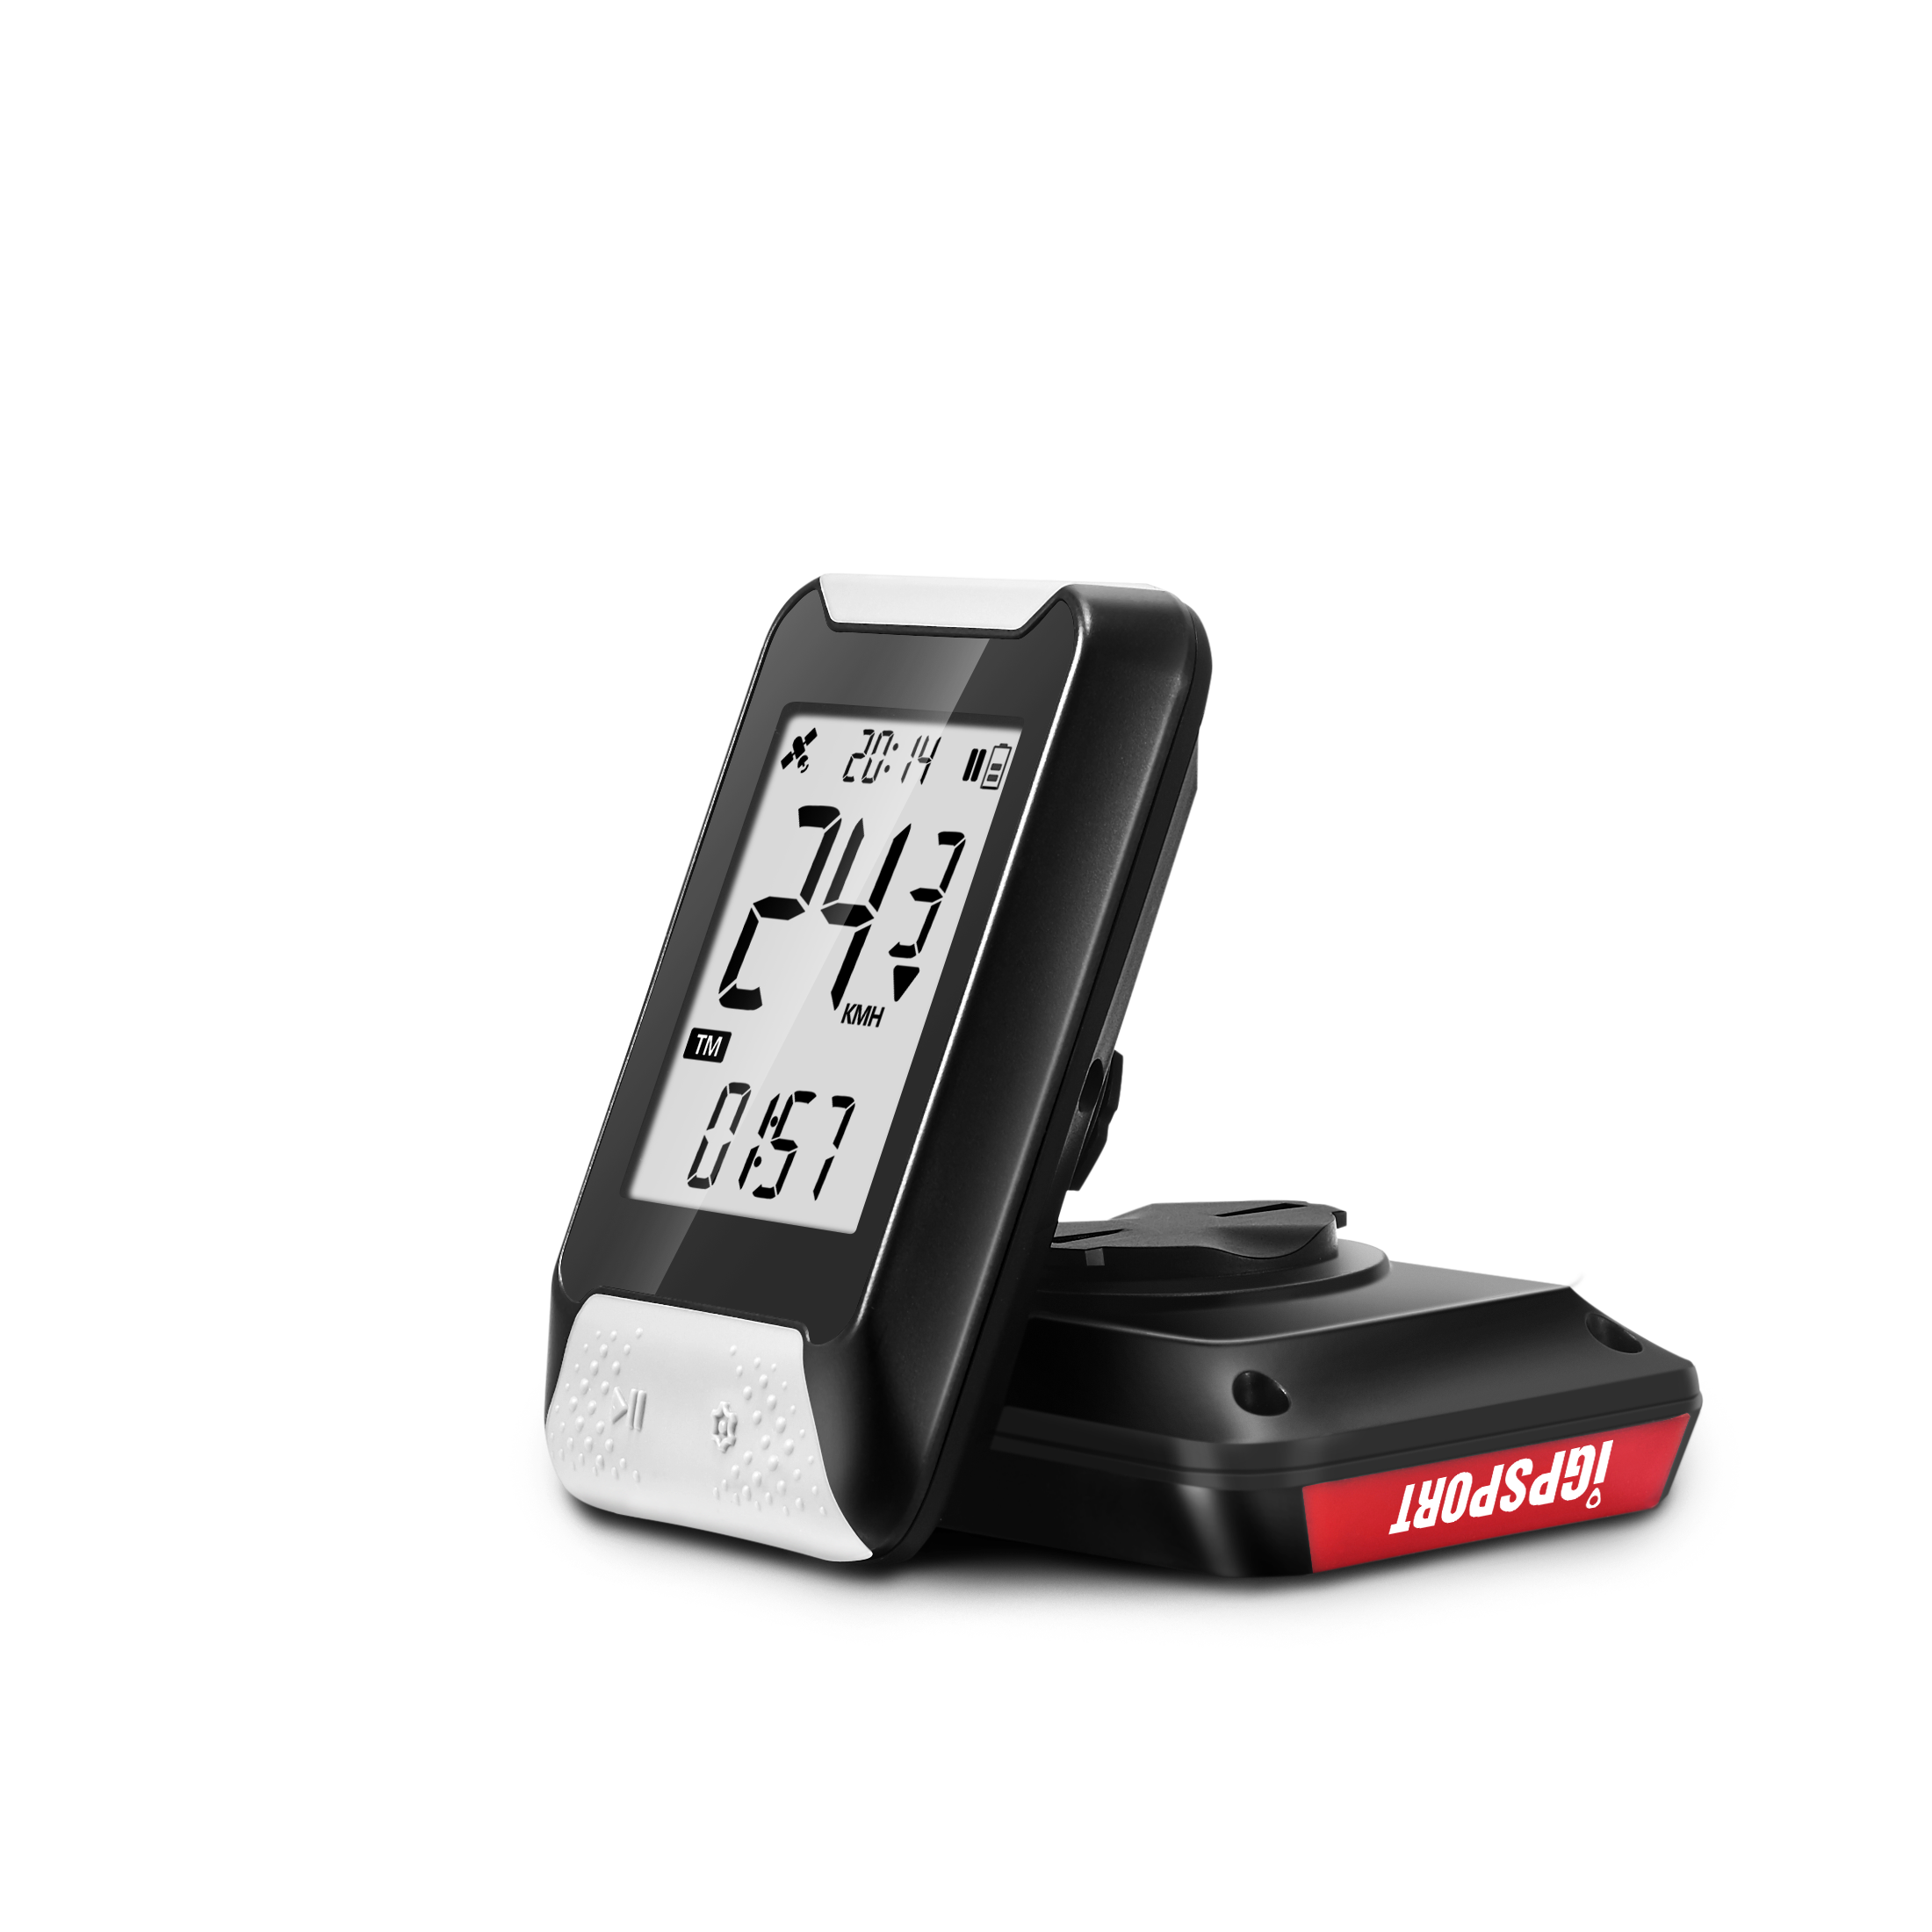 iGPSPORT IGS130 Bicycle Bike Speedometer Computer 2' Screen IPX7 Waterproof Auto Backlight Wireless Max 235KM/H Bike Accessory|Bicycle Computer| |  - title=